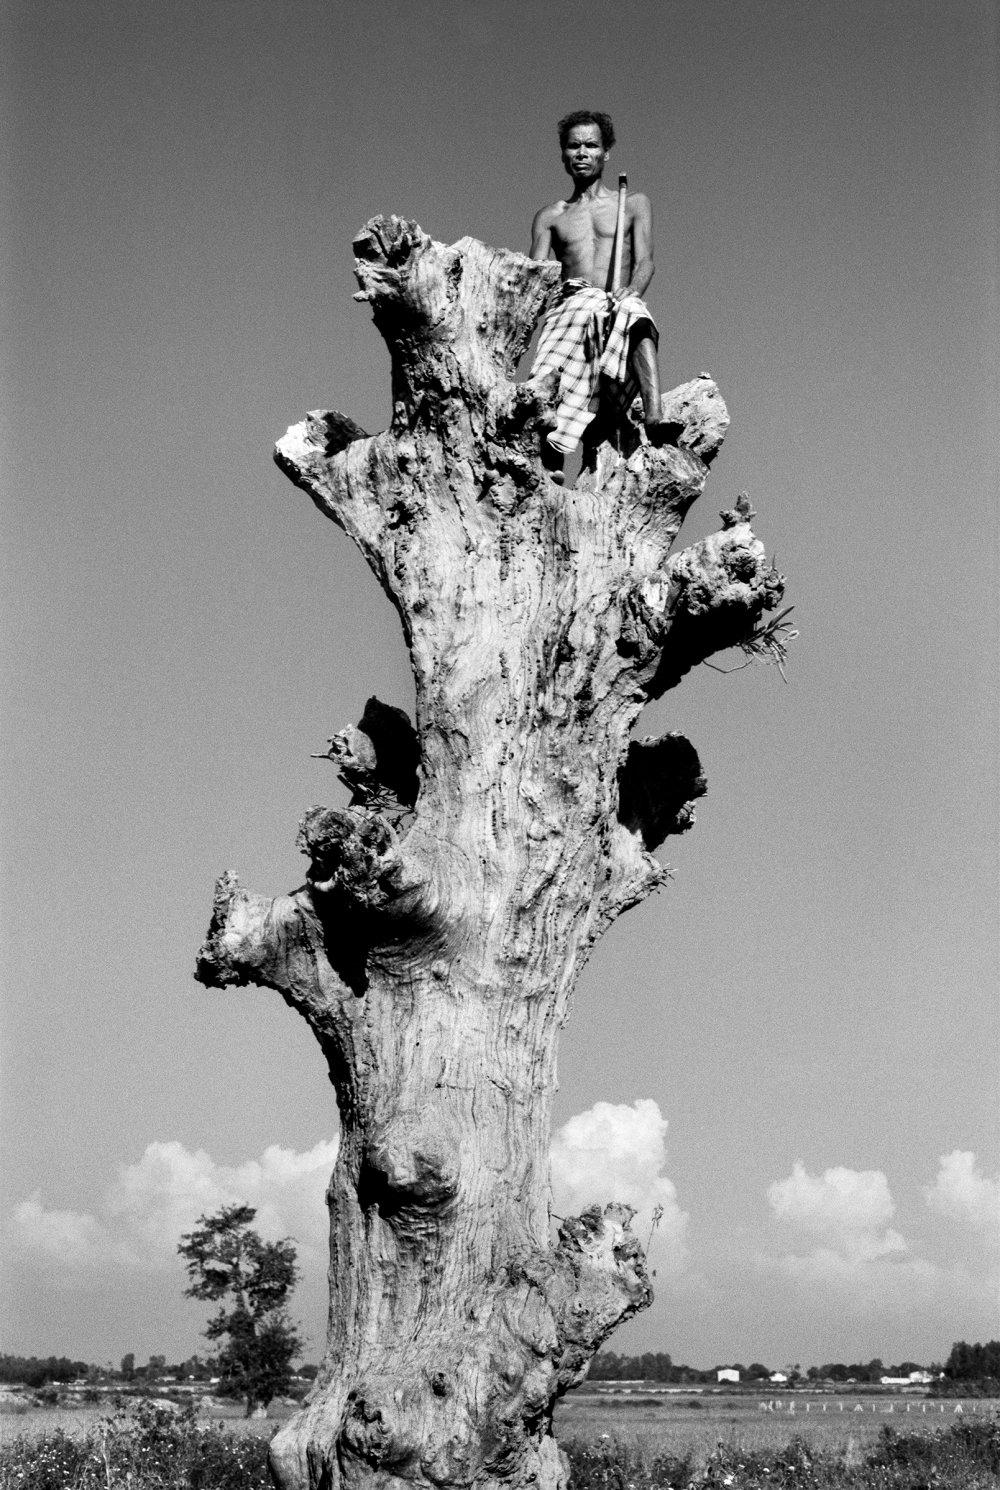 Man on tree on the way to Nagarnar. Bastar, India